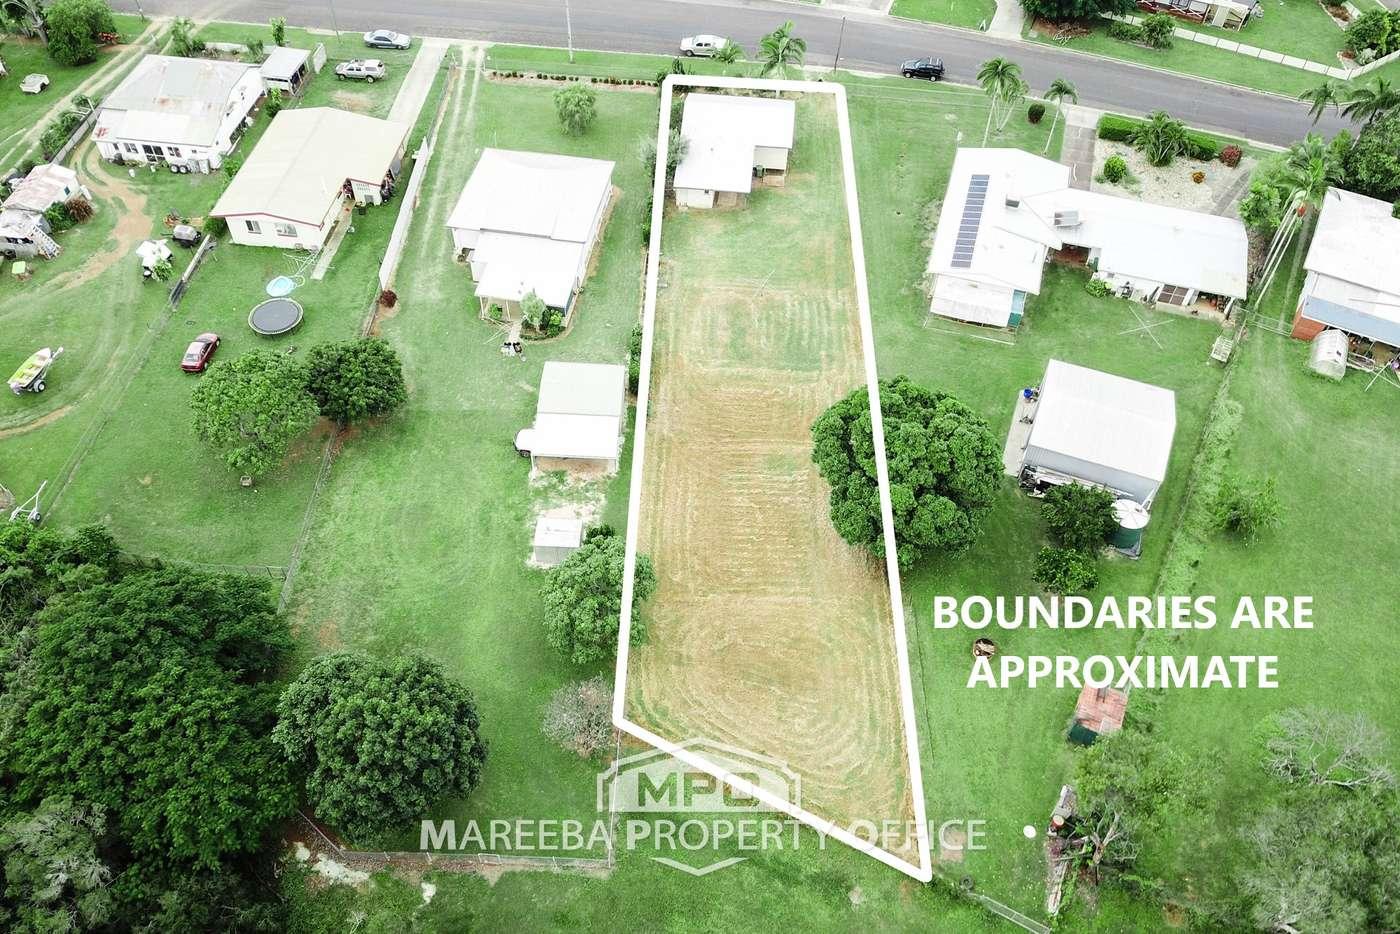 Main view of Homely house listing, 112 Mason Street, Mareeba QLD 4880